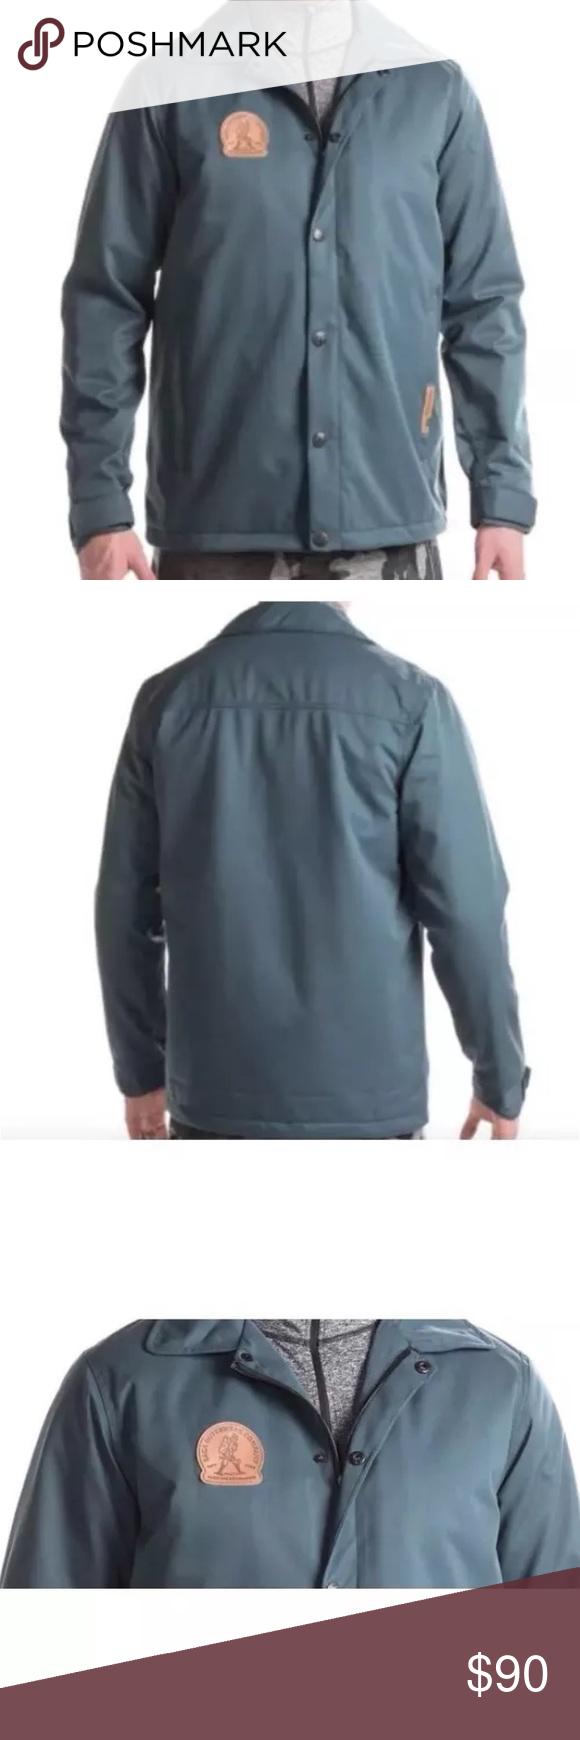 Saga Blue Waterproof Insulated Team Jacket Team Jackets Waterproof Breathable Fabric Jackets [ 1740 x 580 Pixel ]